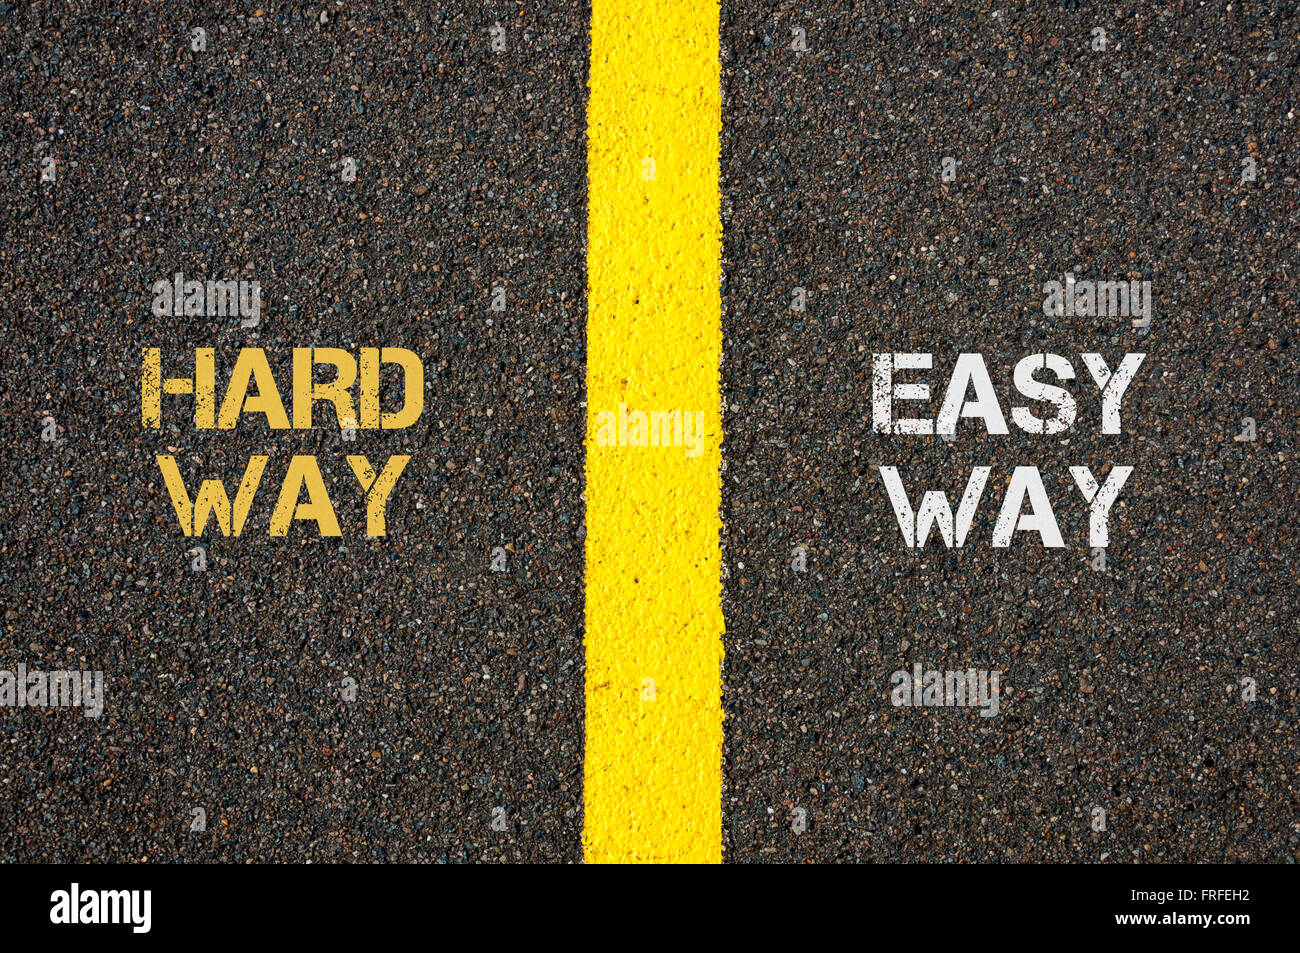 Antonym concept of HARD WAY versus EASY WAY written over tarmac, road marking yellow paint separating line between Stock Photo